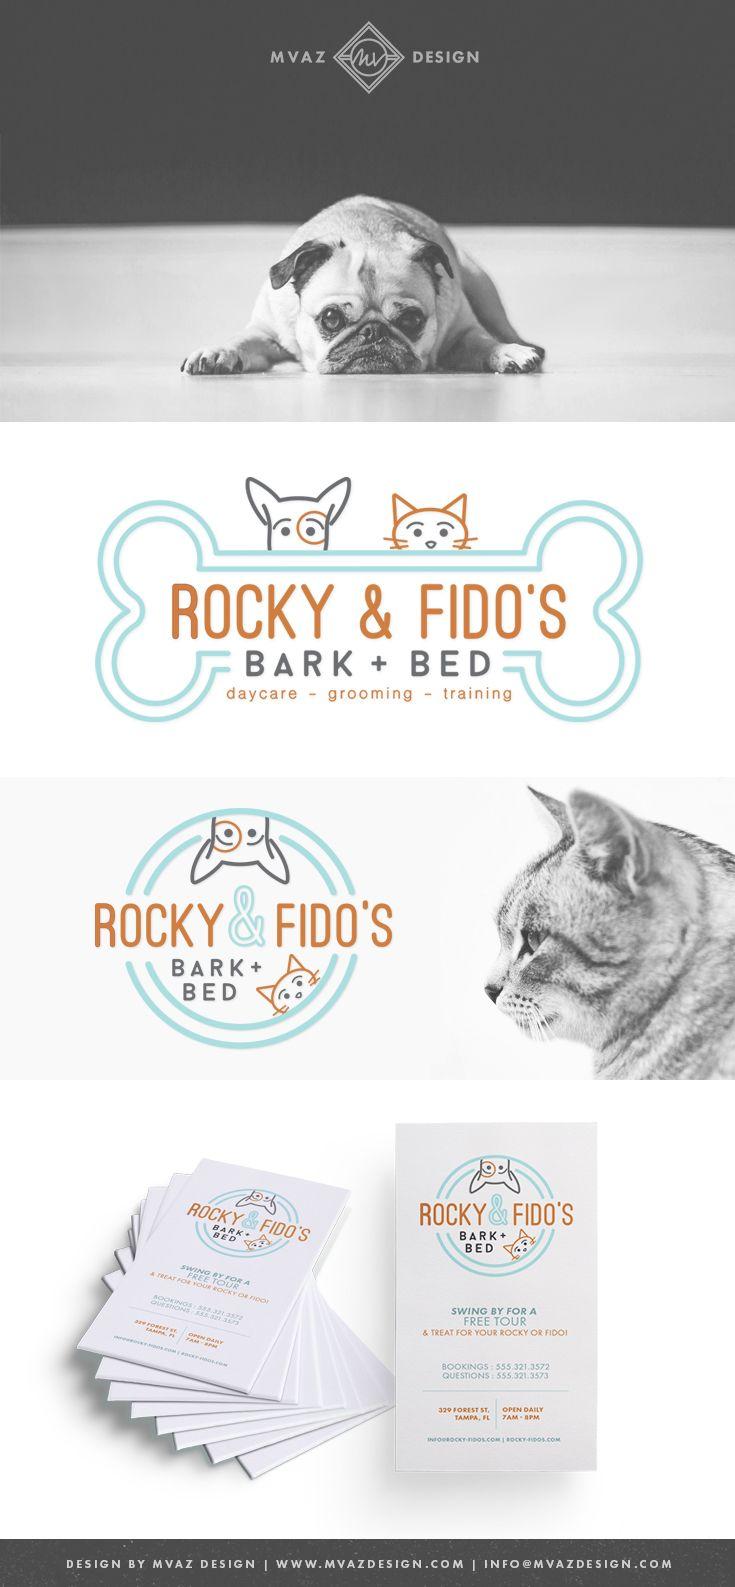 Rocky & Fido's | Bark + Bed Pet Daycare, Grooming, & Traning | Pet Business Branding | Brand Identity | Designed by: MVAZ Design